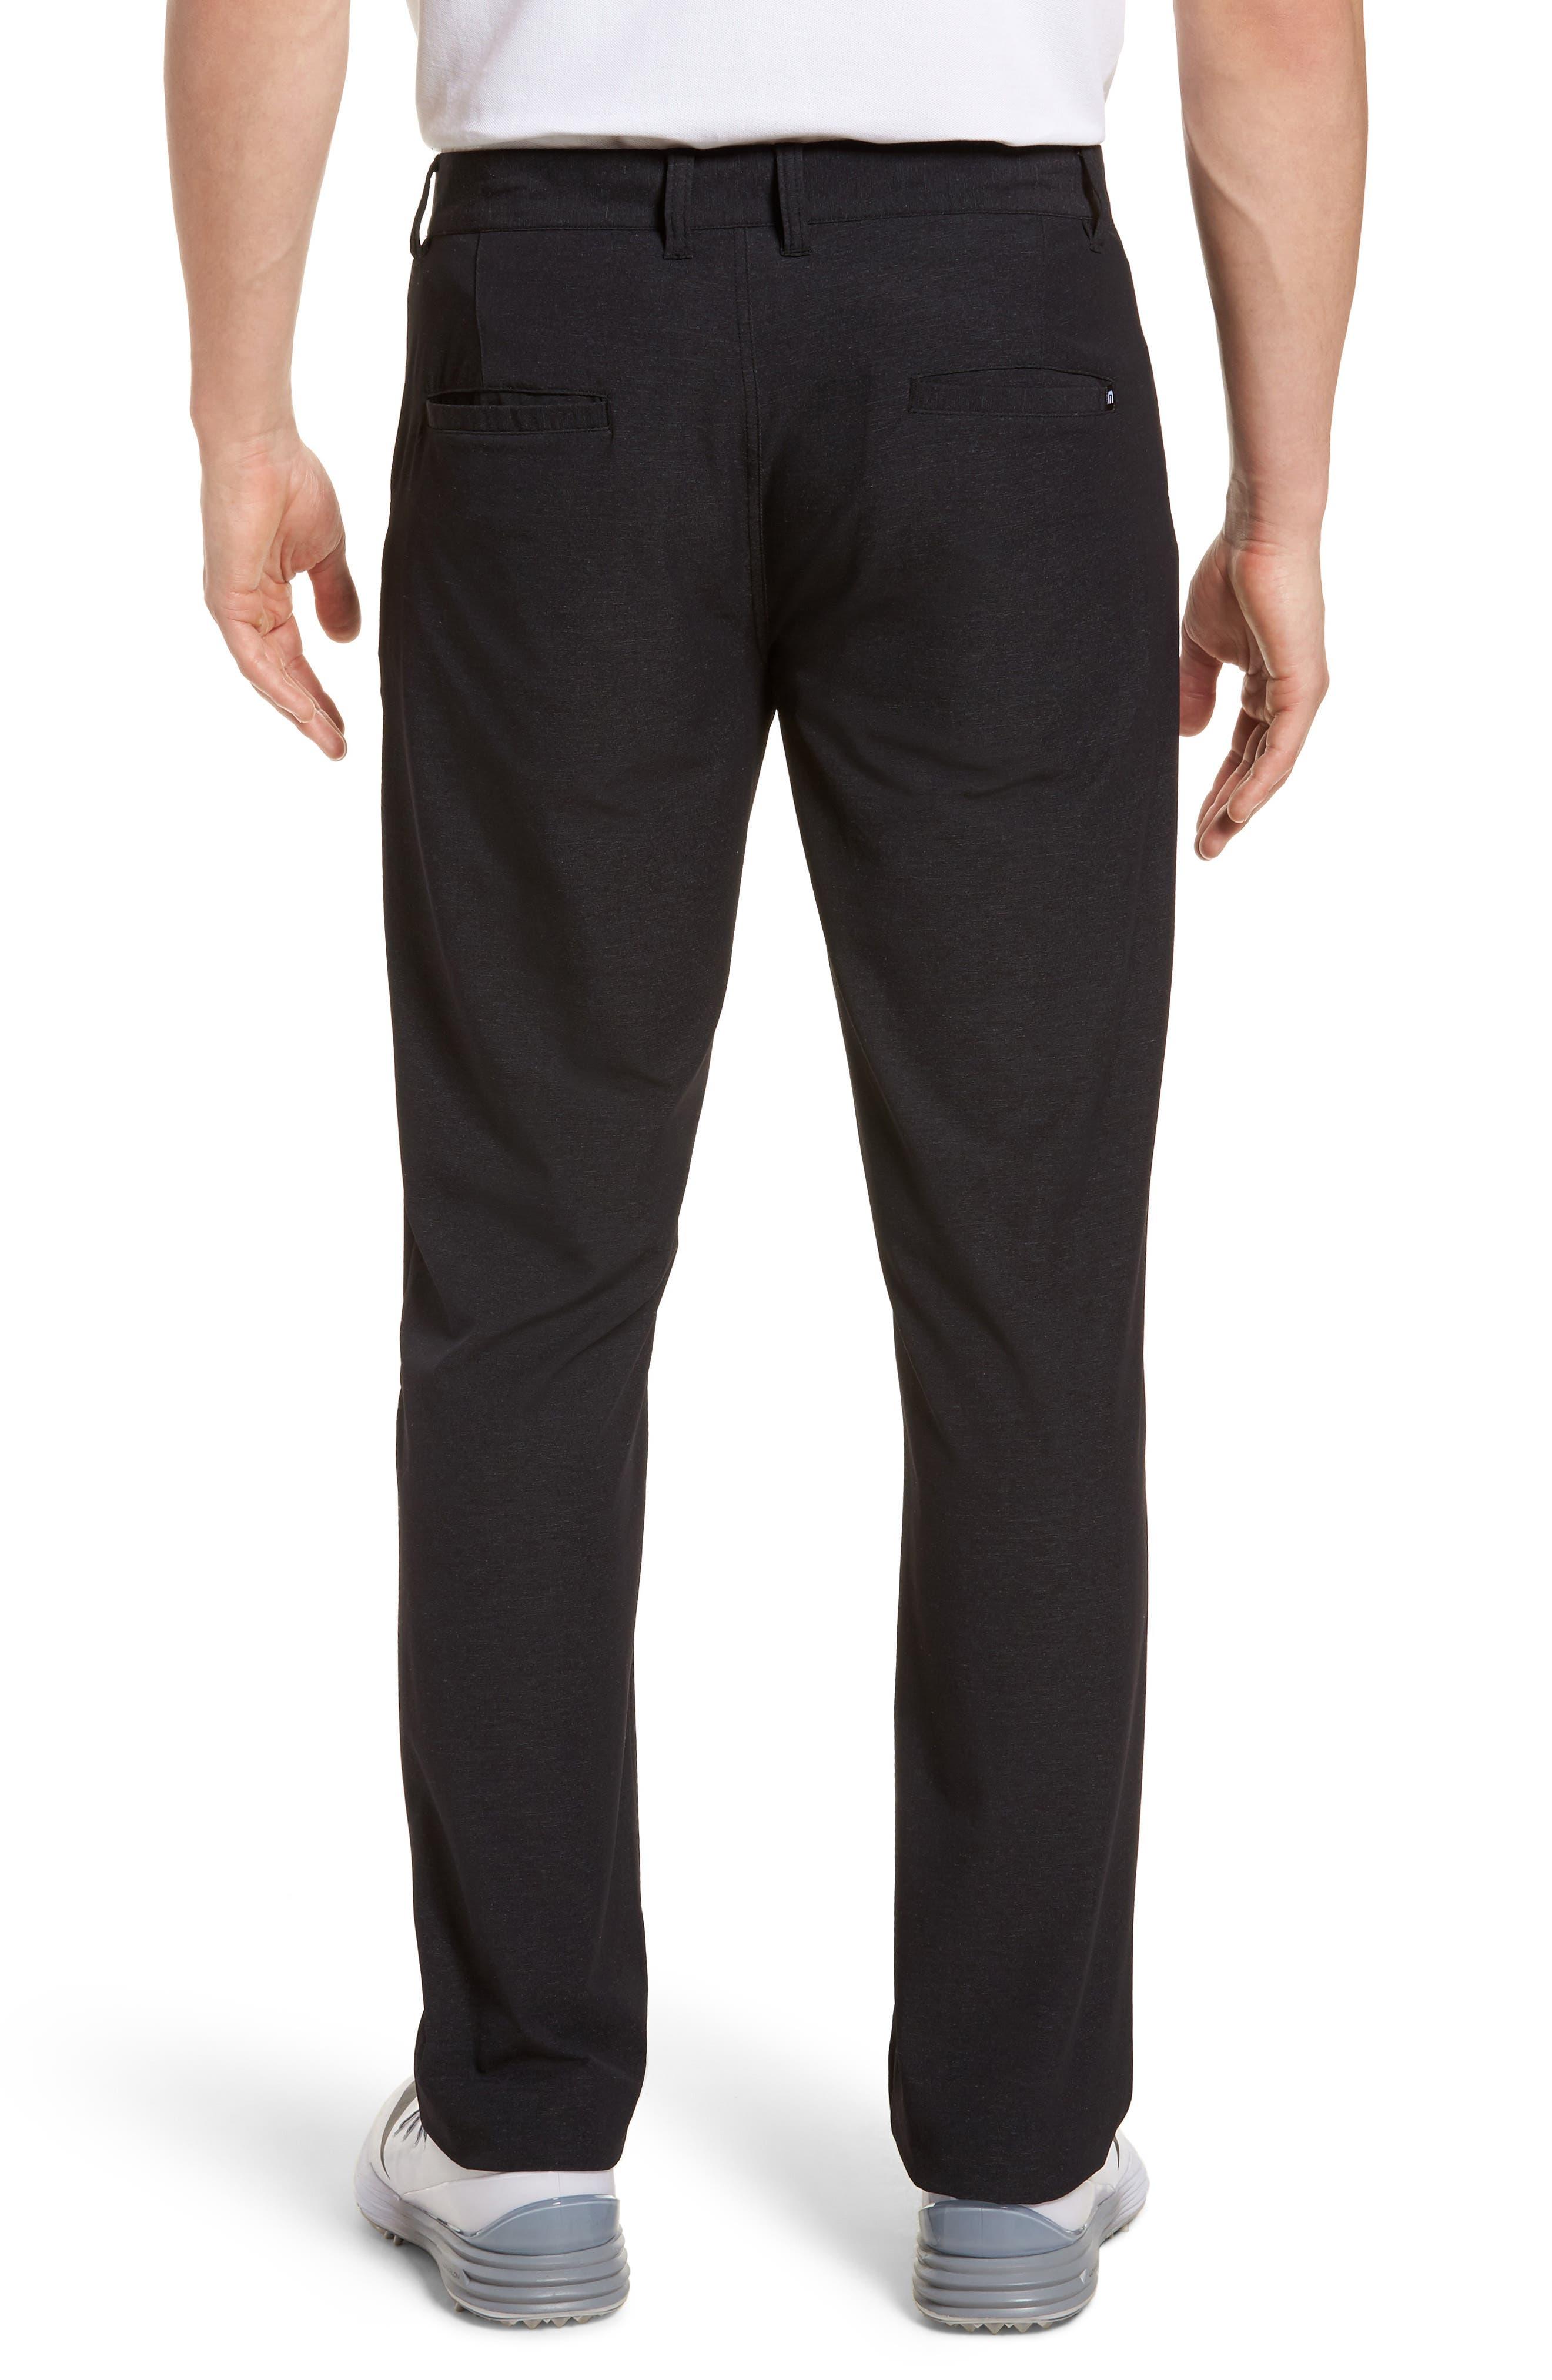 Mercurio Regular Fit Four-Way Stretch Pants,                             Alternate thumbnail 2, color,                             HEATHER BLACK